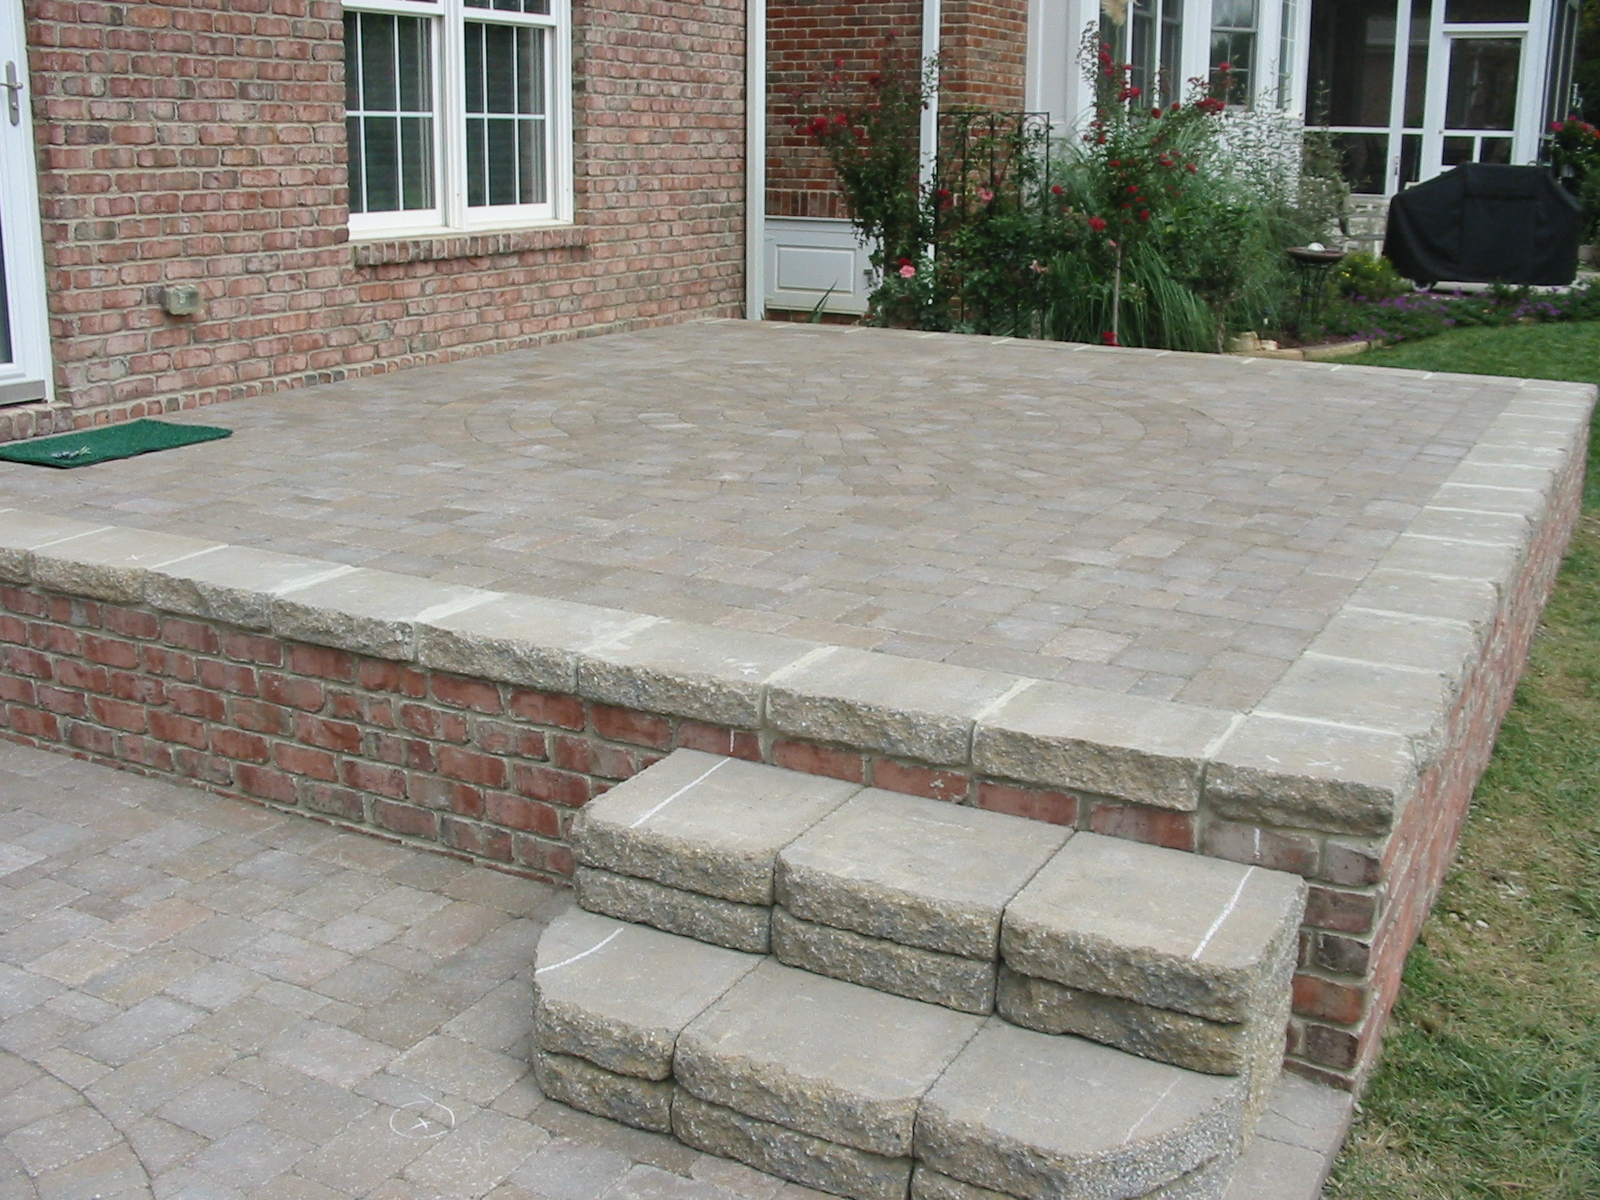 Paver vs Concrete or Asphalt  Burlington Landscaper  Triad Landscaping  Outdoor Kitchens